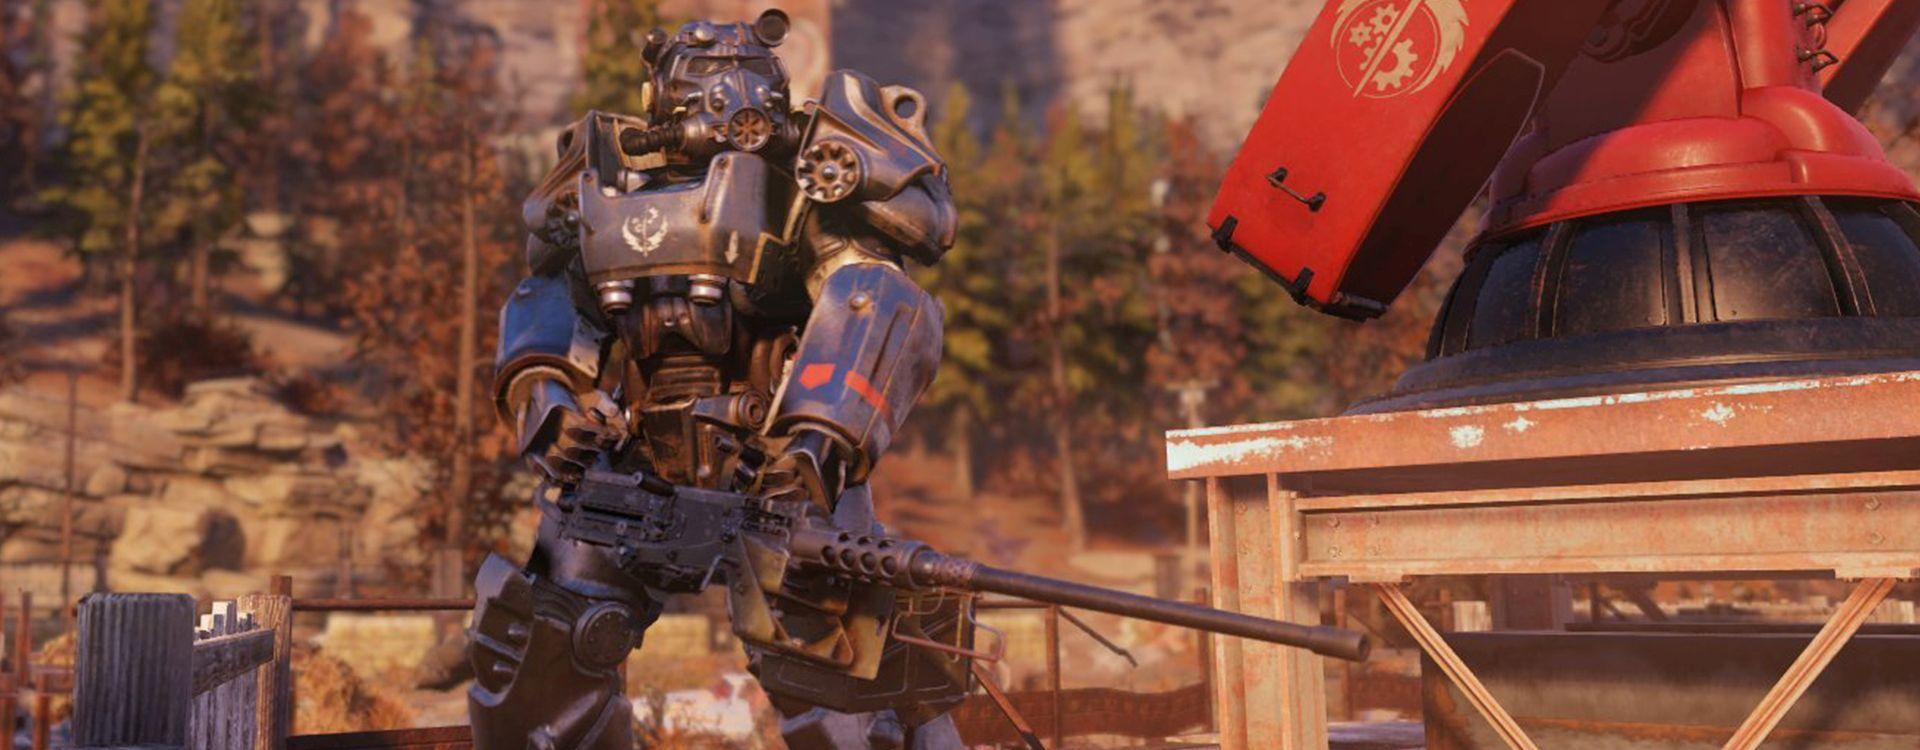 Fallout 76 teilt Roadmap für 2020, bringt 3 Seasons und legendäre NPCs